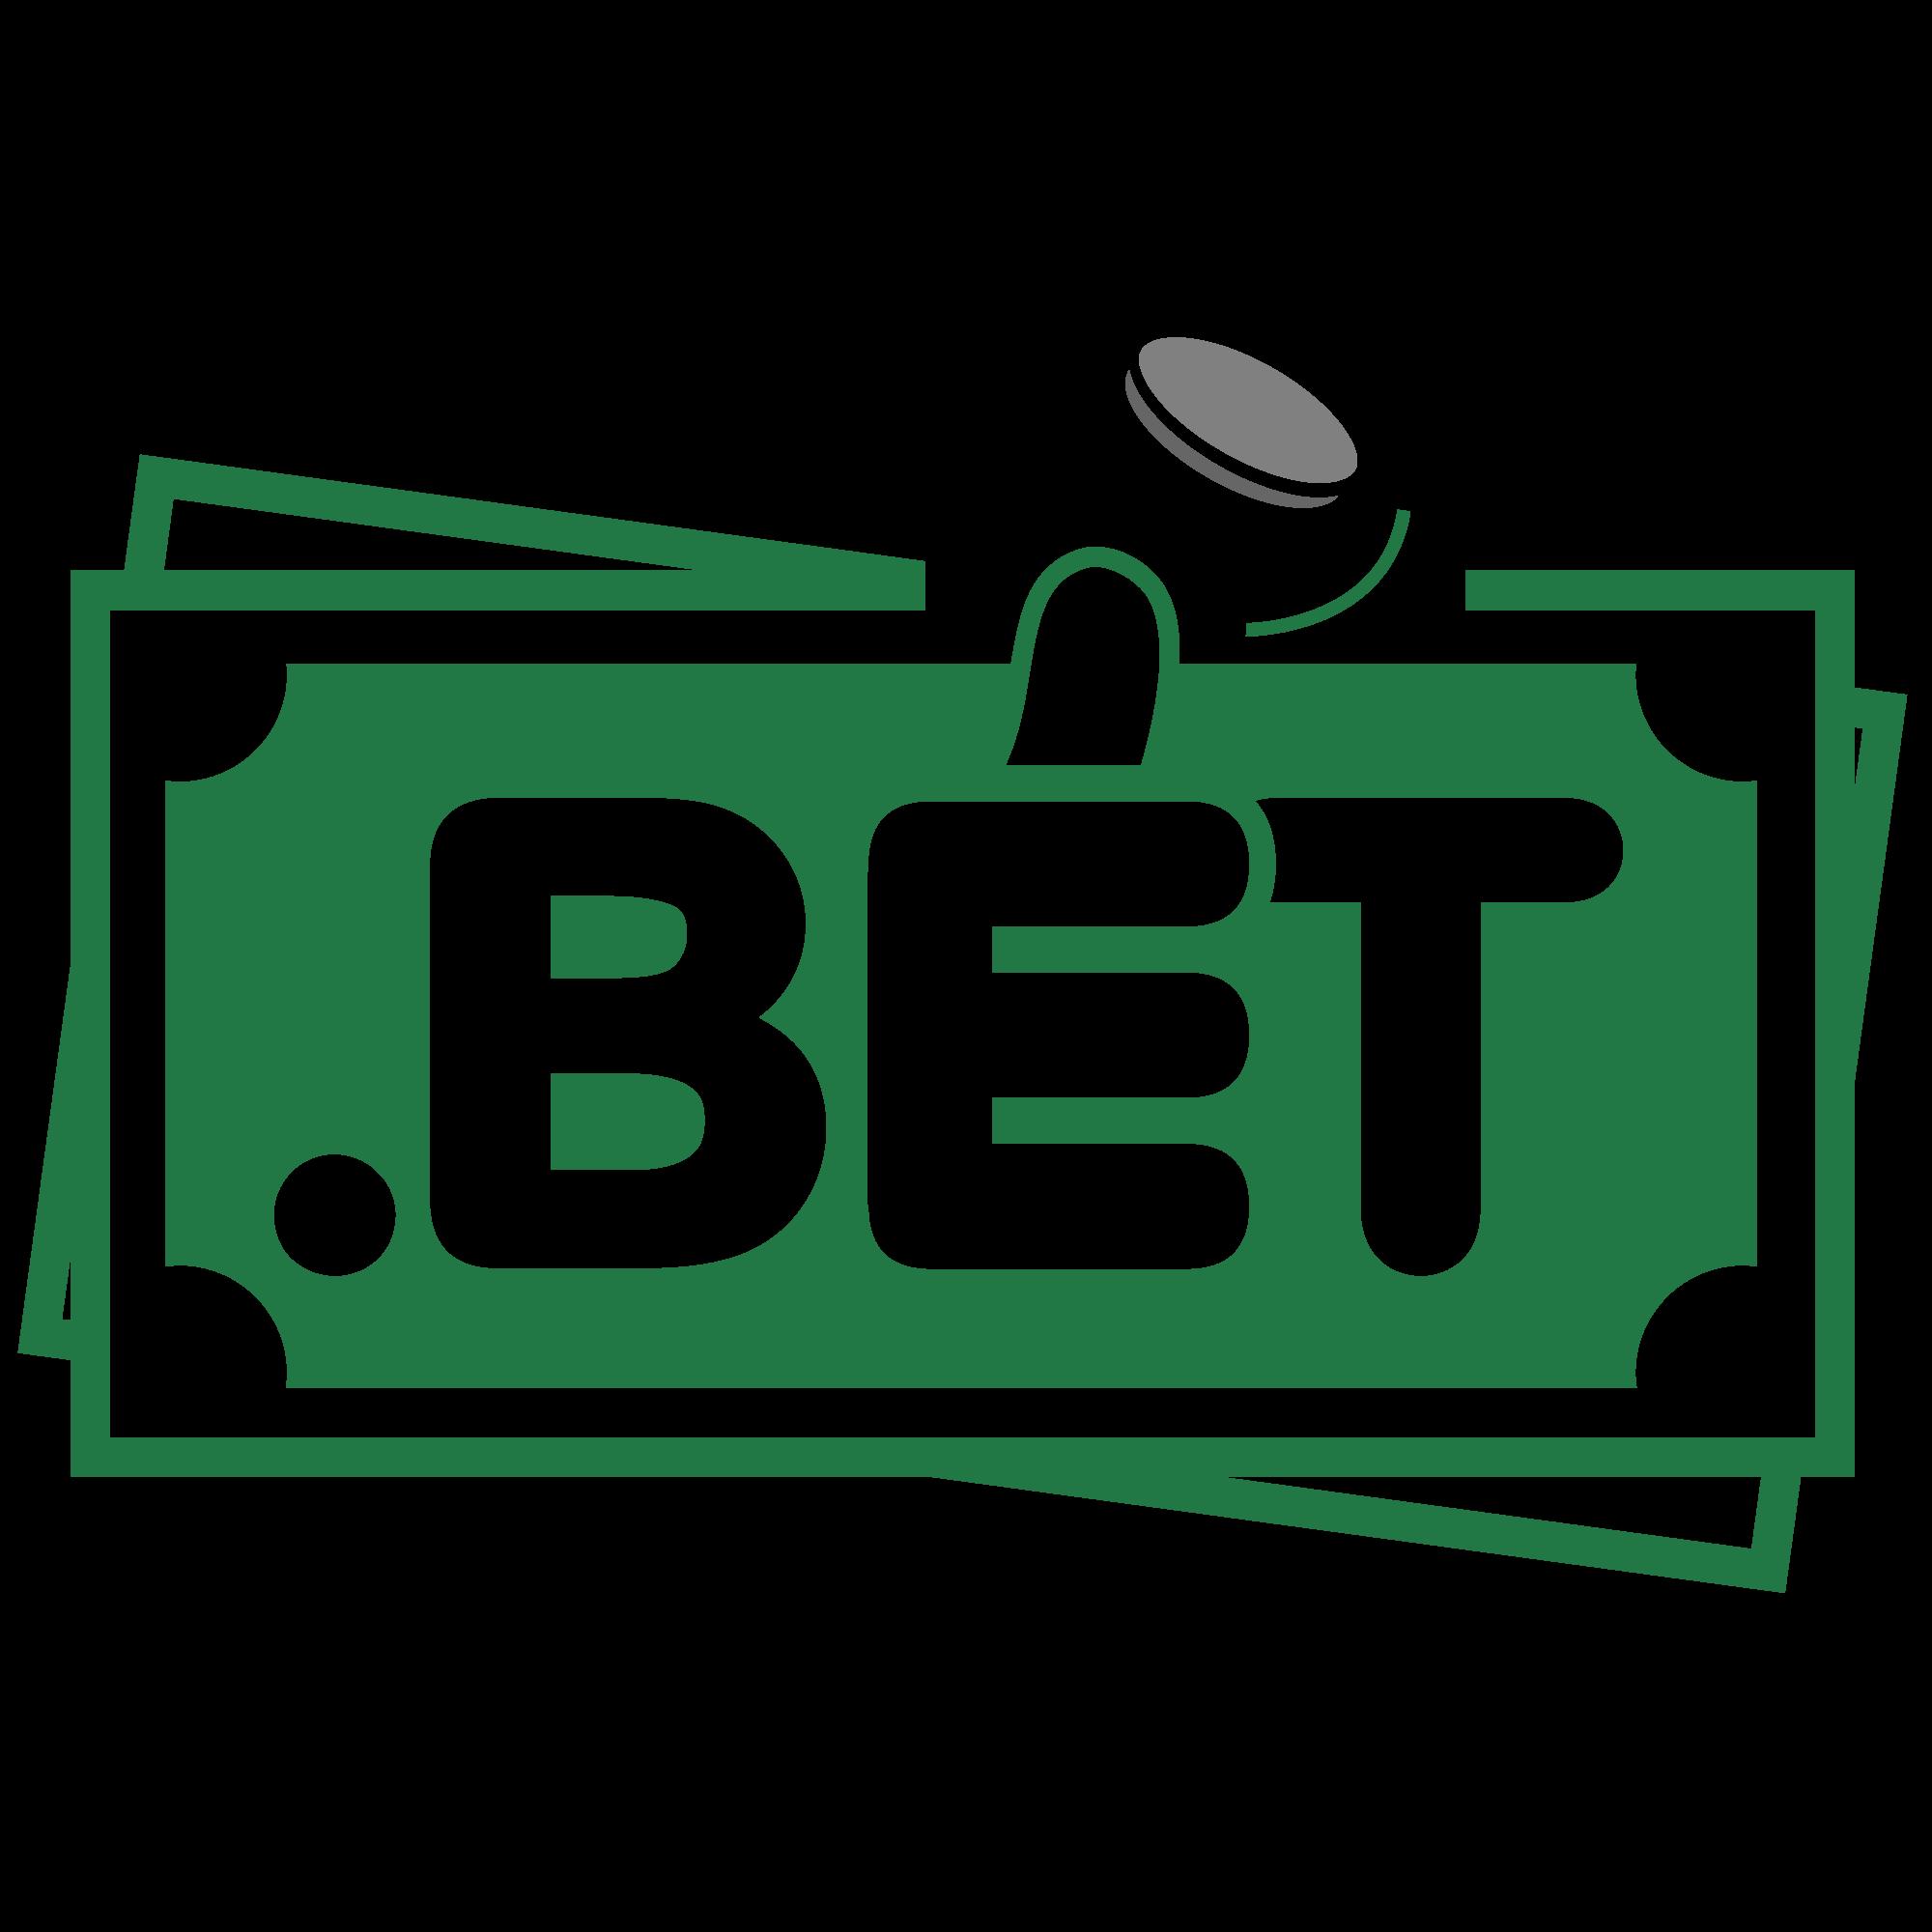 .BET TLD logo